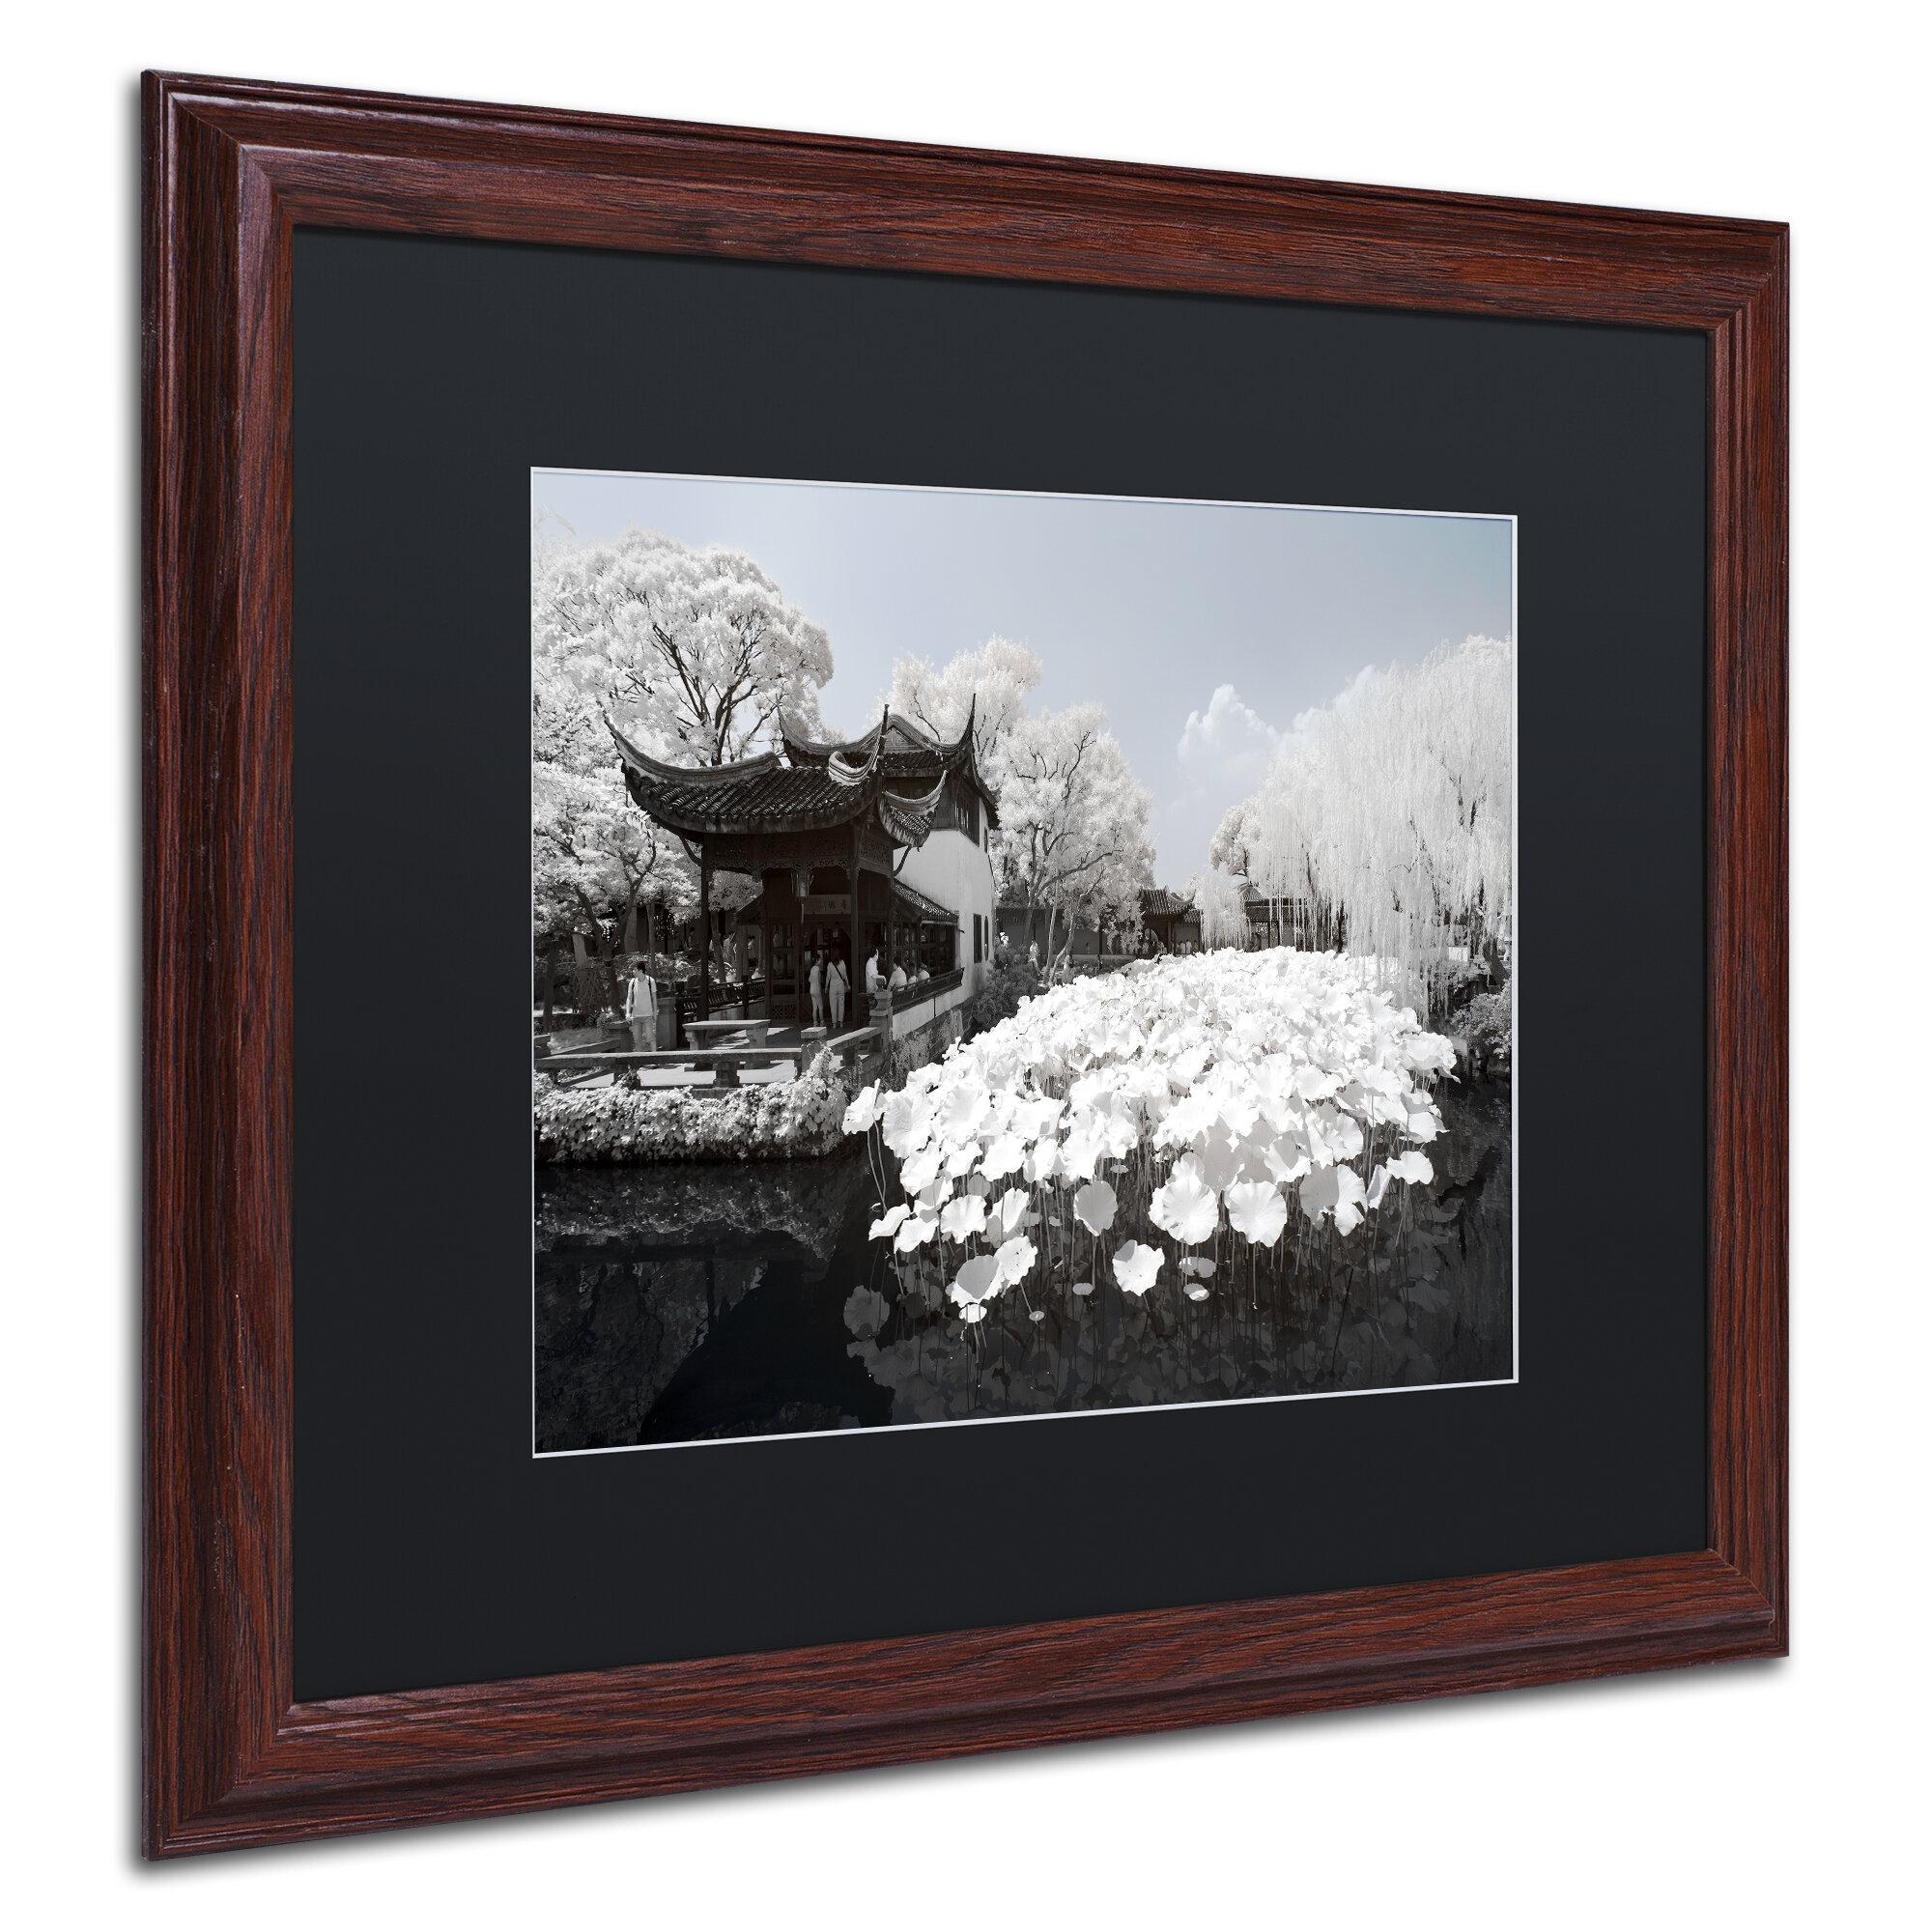 Trademark Art Meditation By Philippe Hugonnard Framed Photographic Print Wayfair